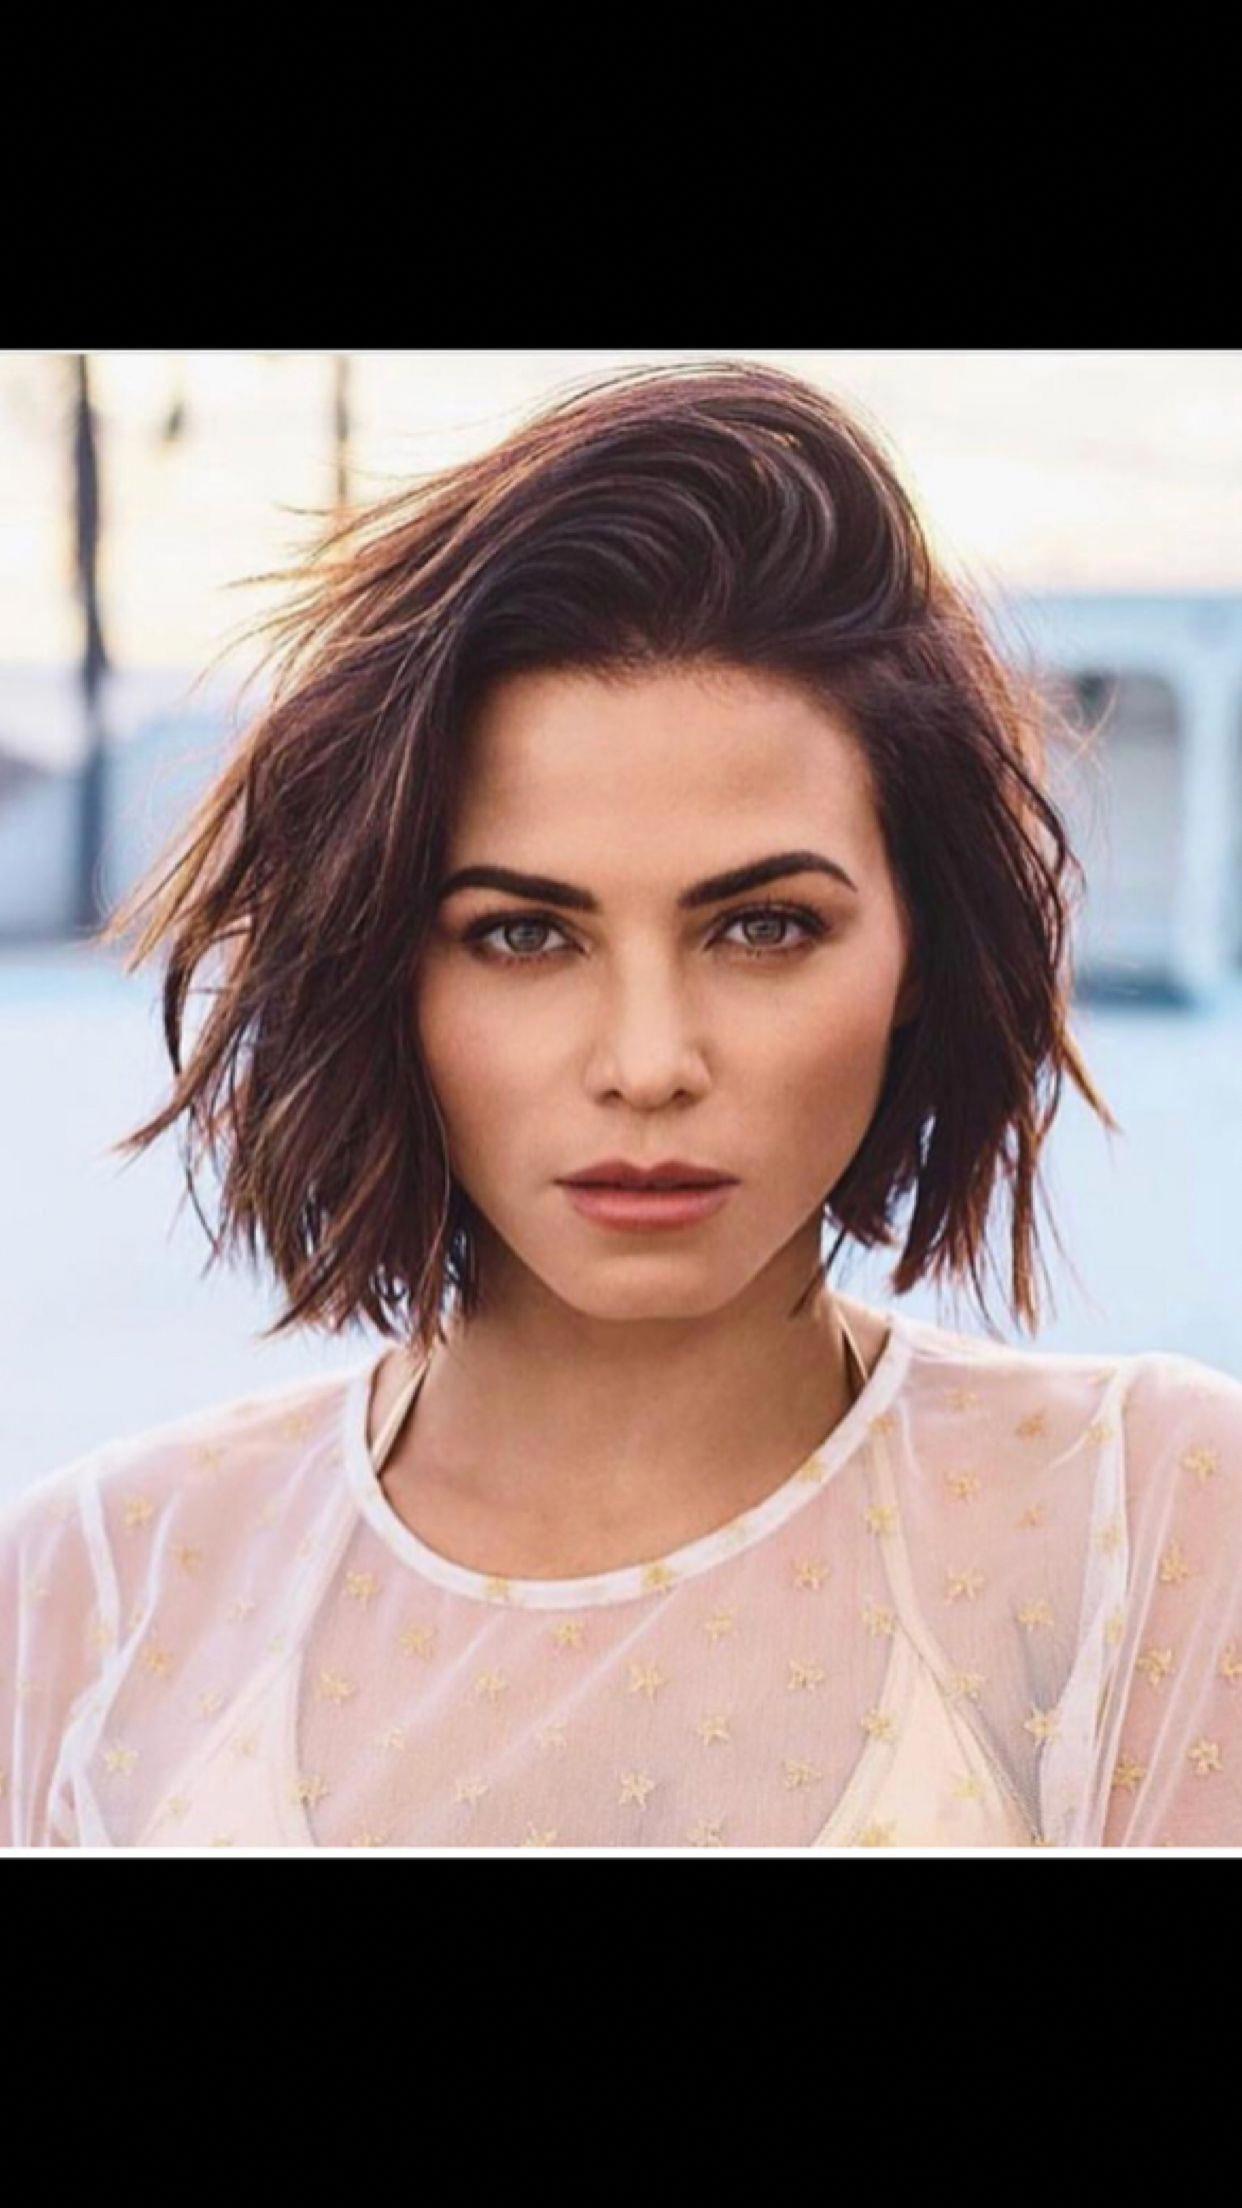 woman short hair brunette